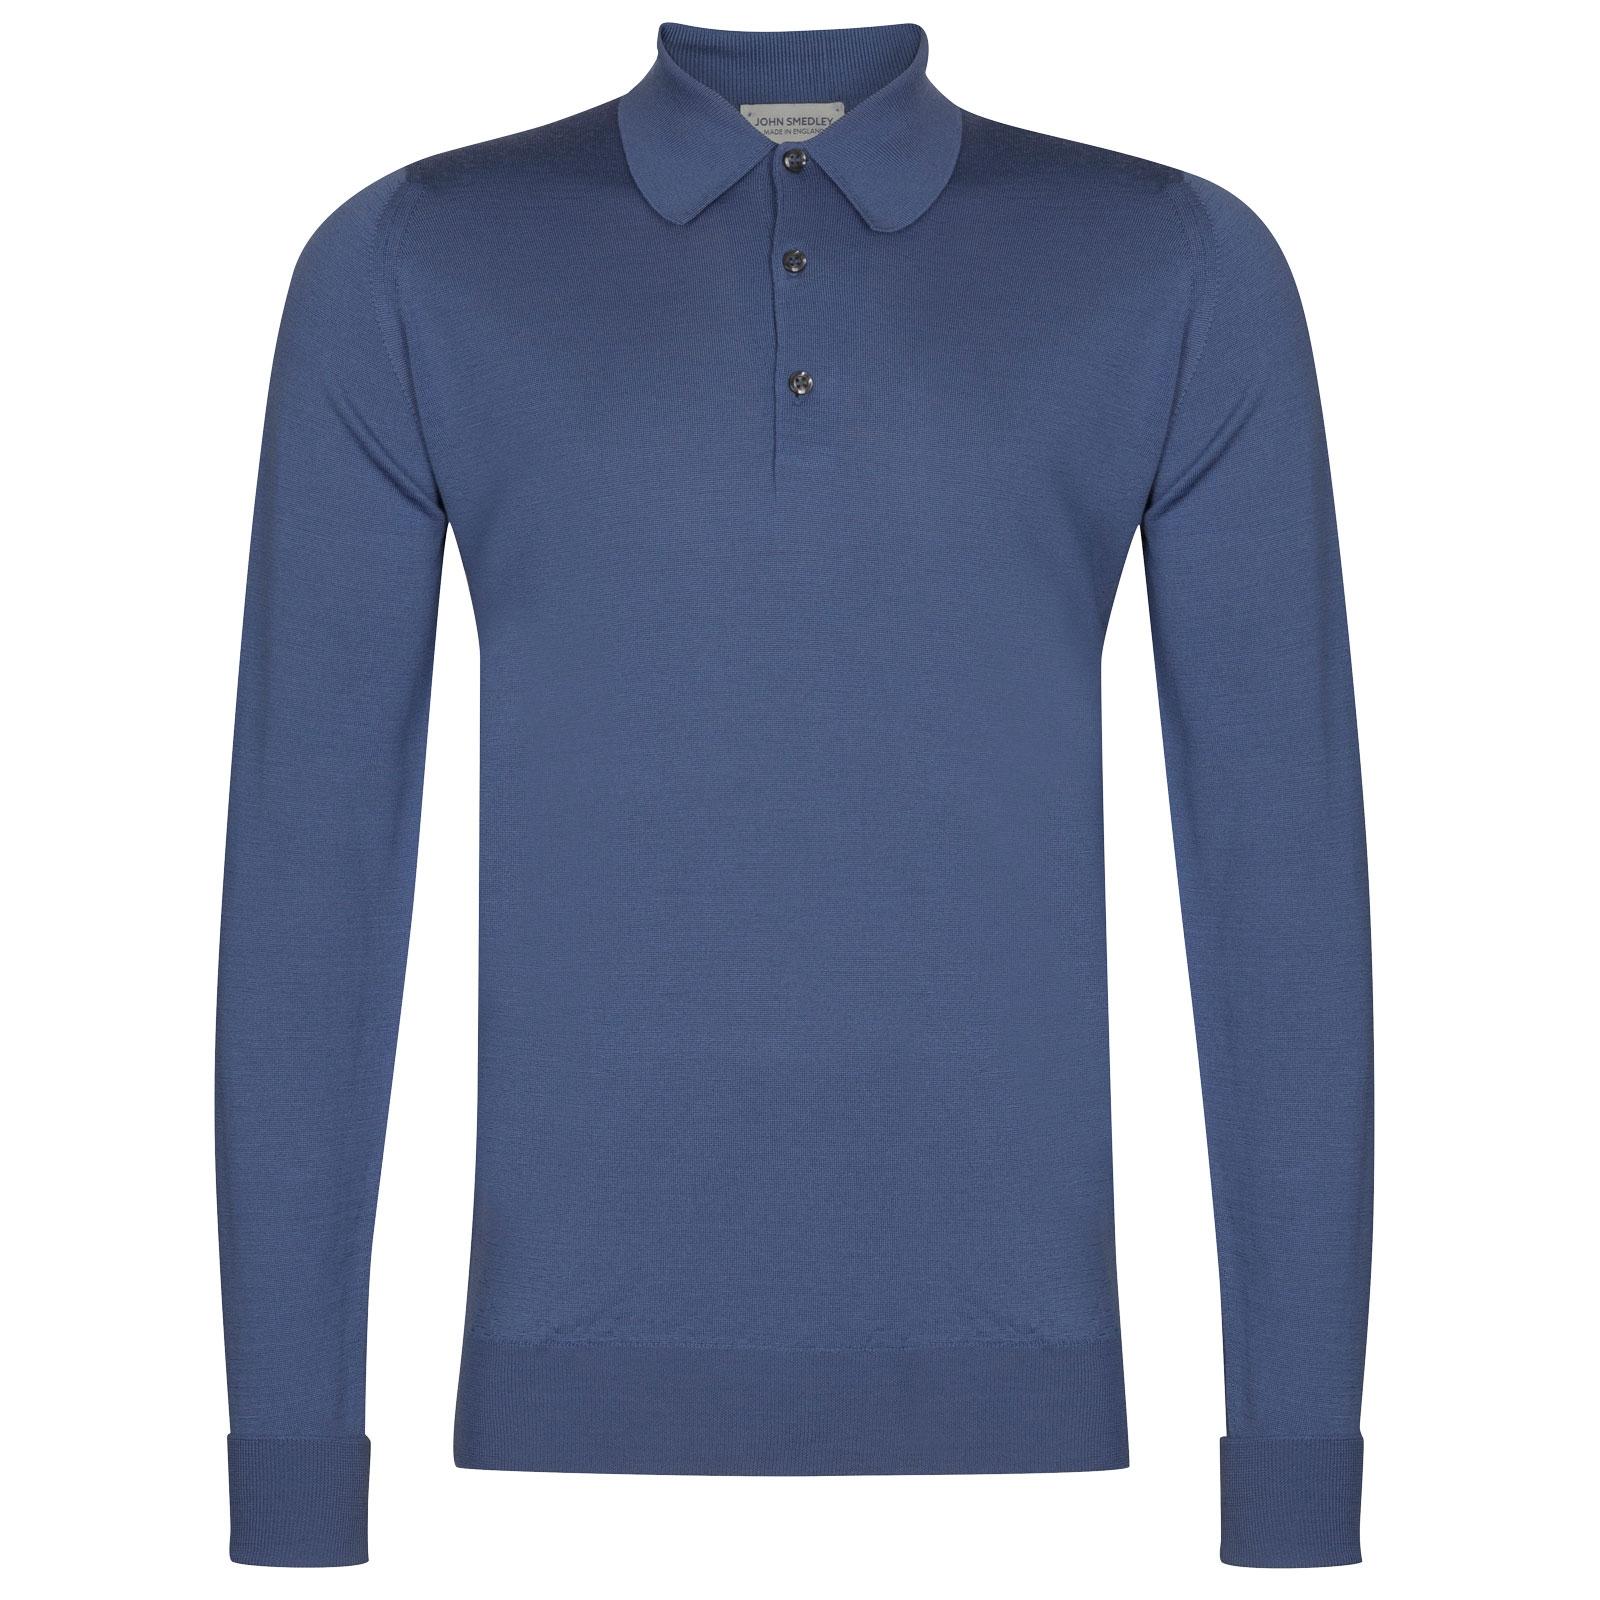 John Smedley Dorset in Blue Iris Shirt-xsm